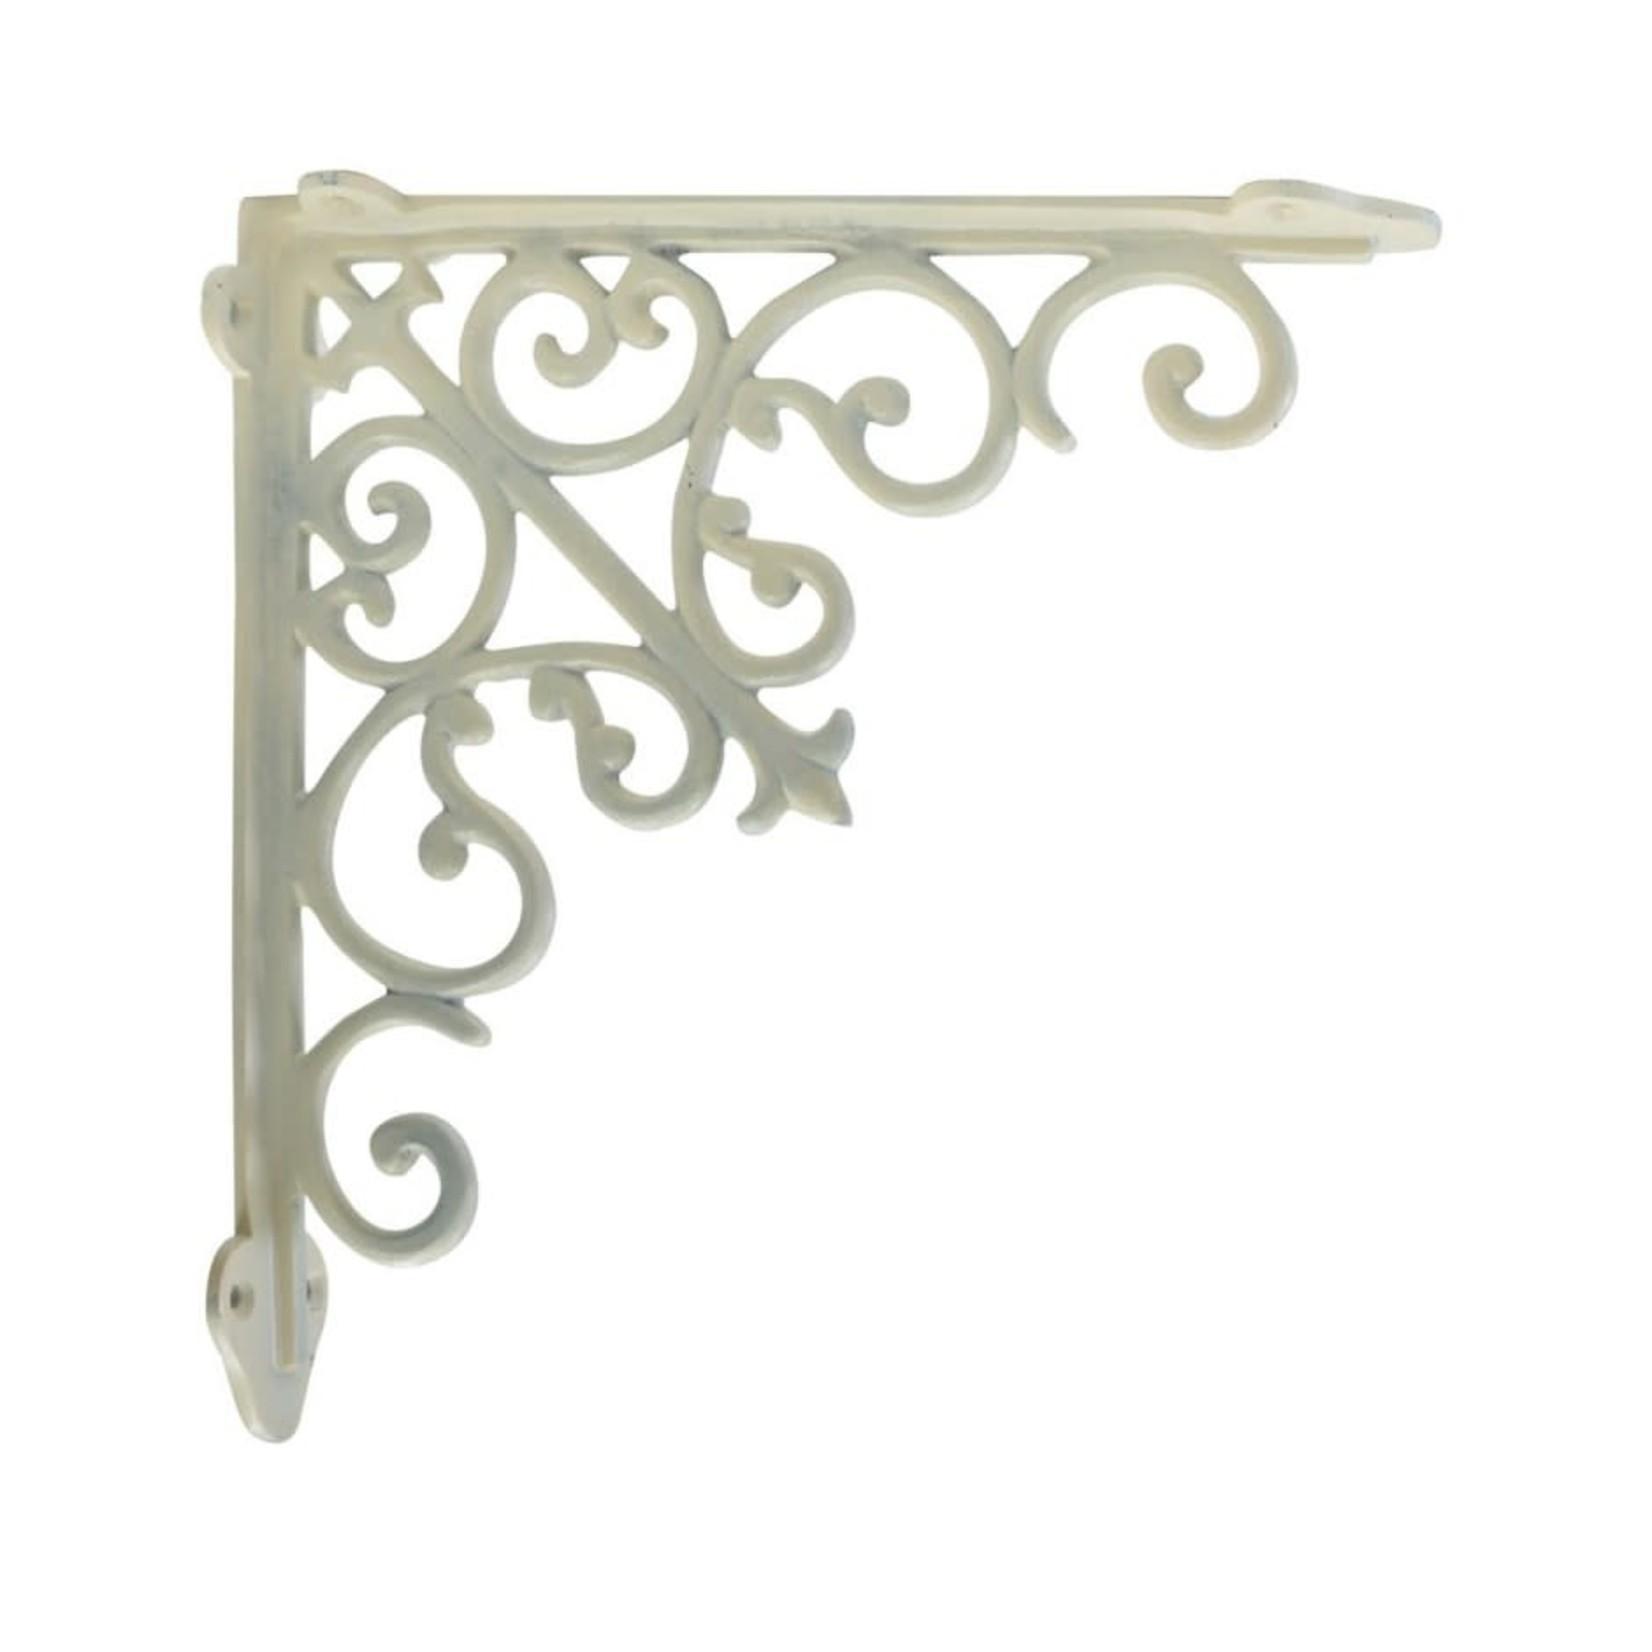 Victoria Shelf Bracket - Medium White